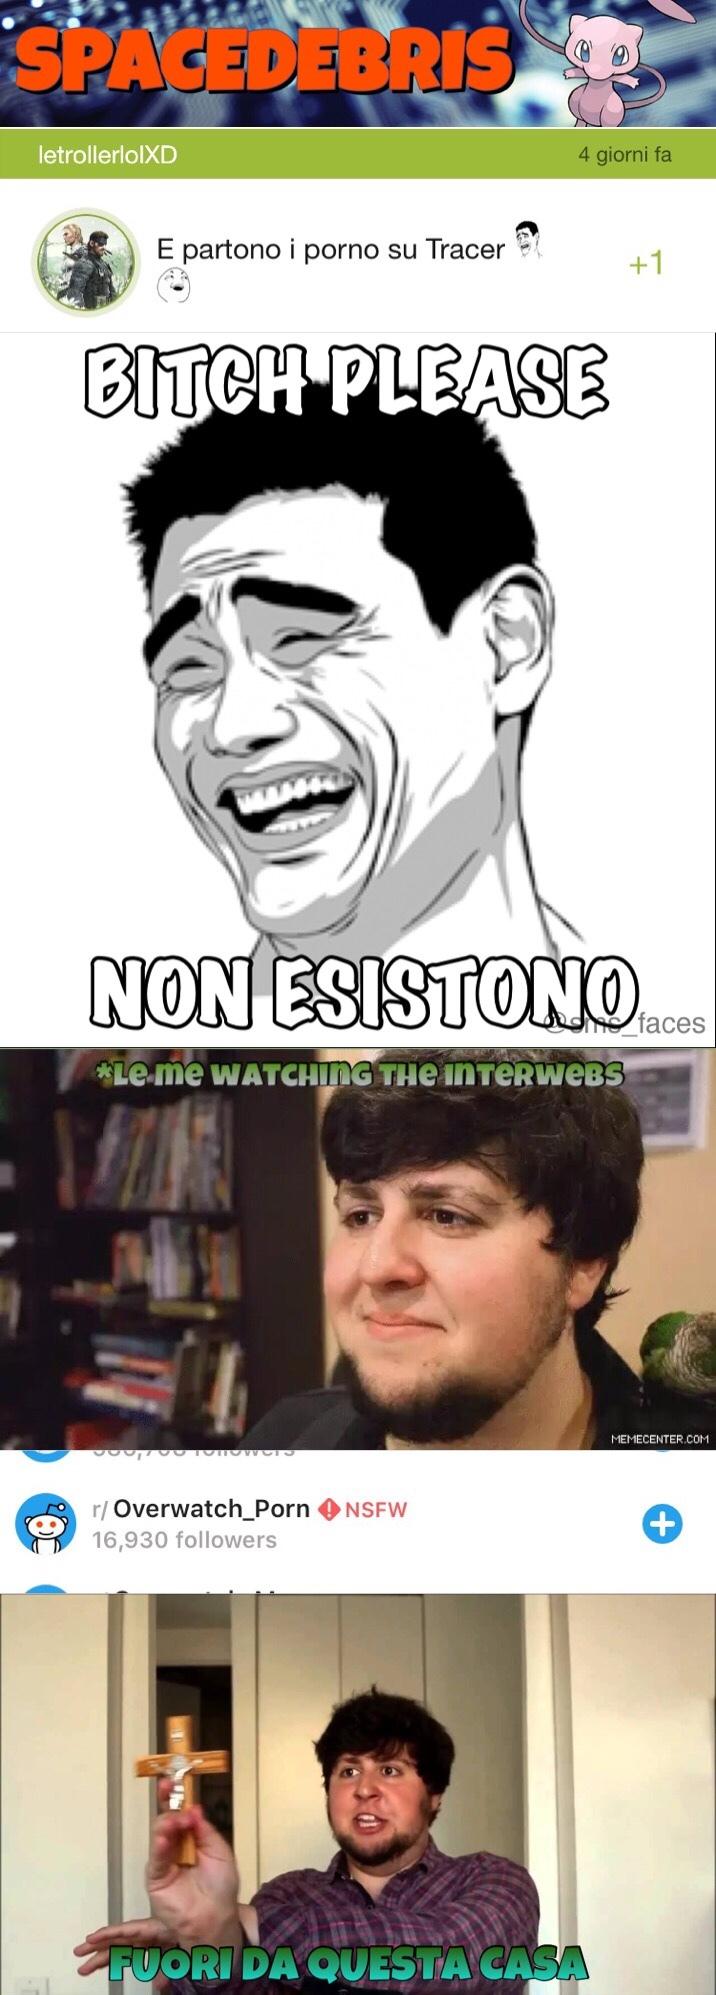 cito letrollerlolXD - meme